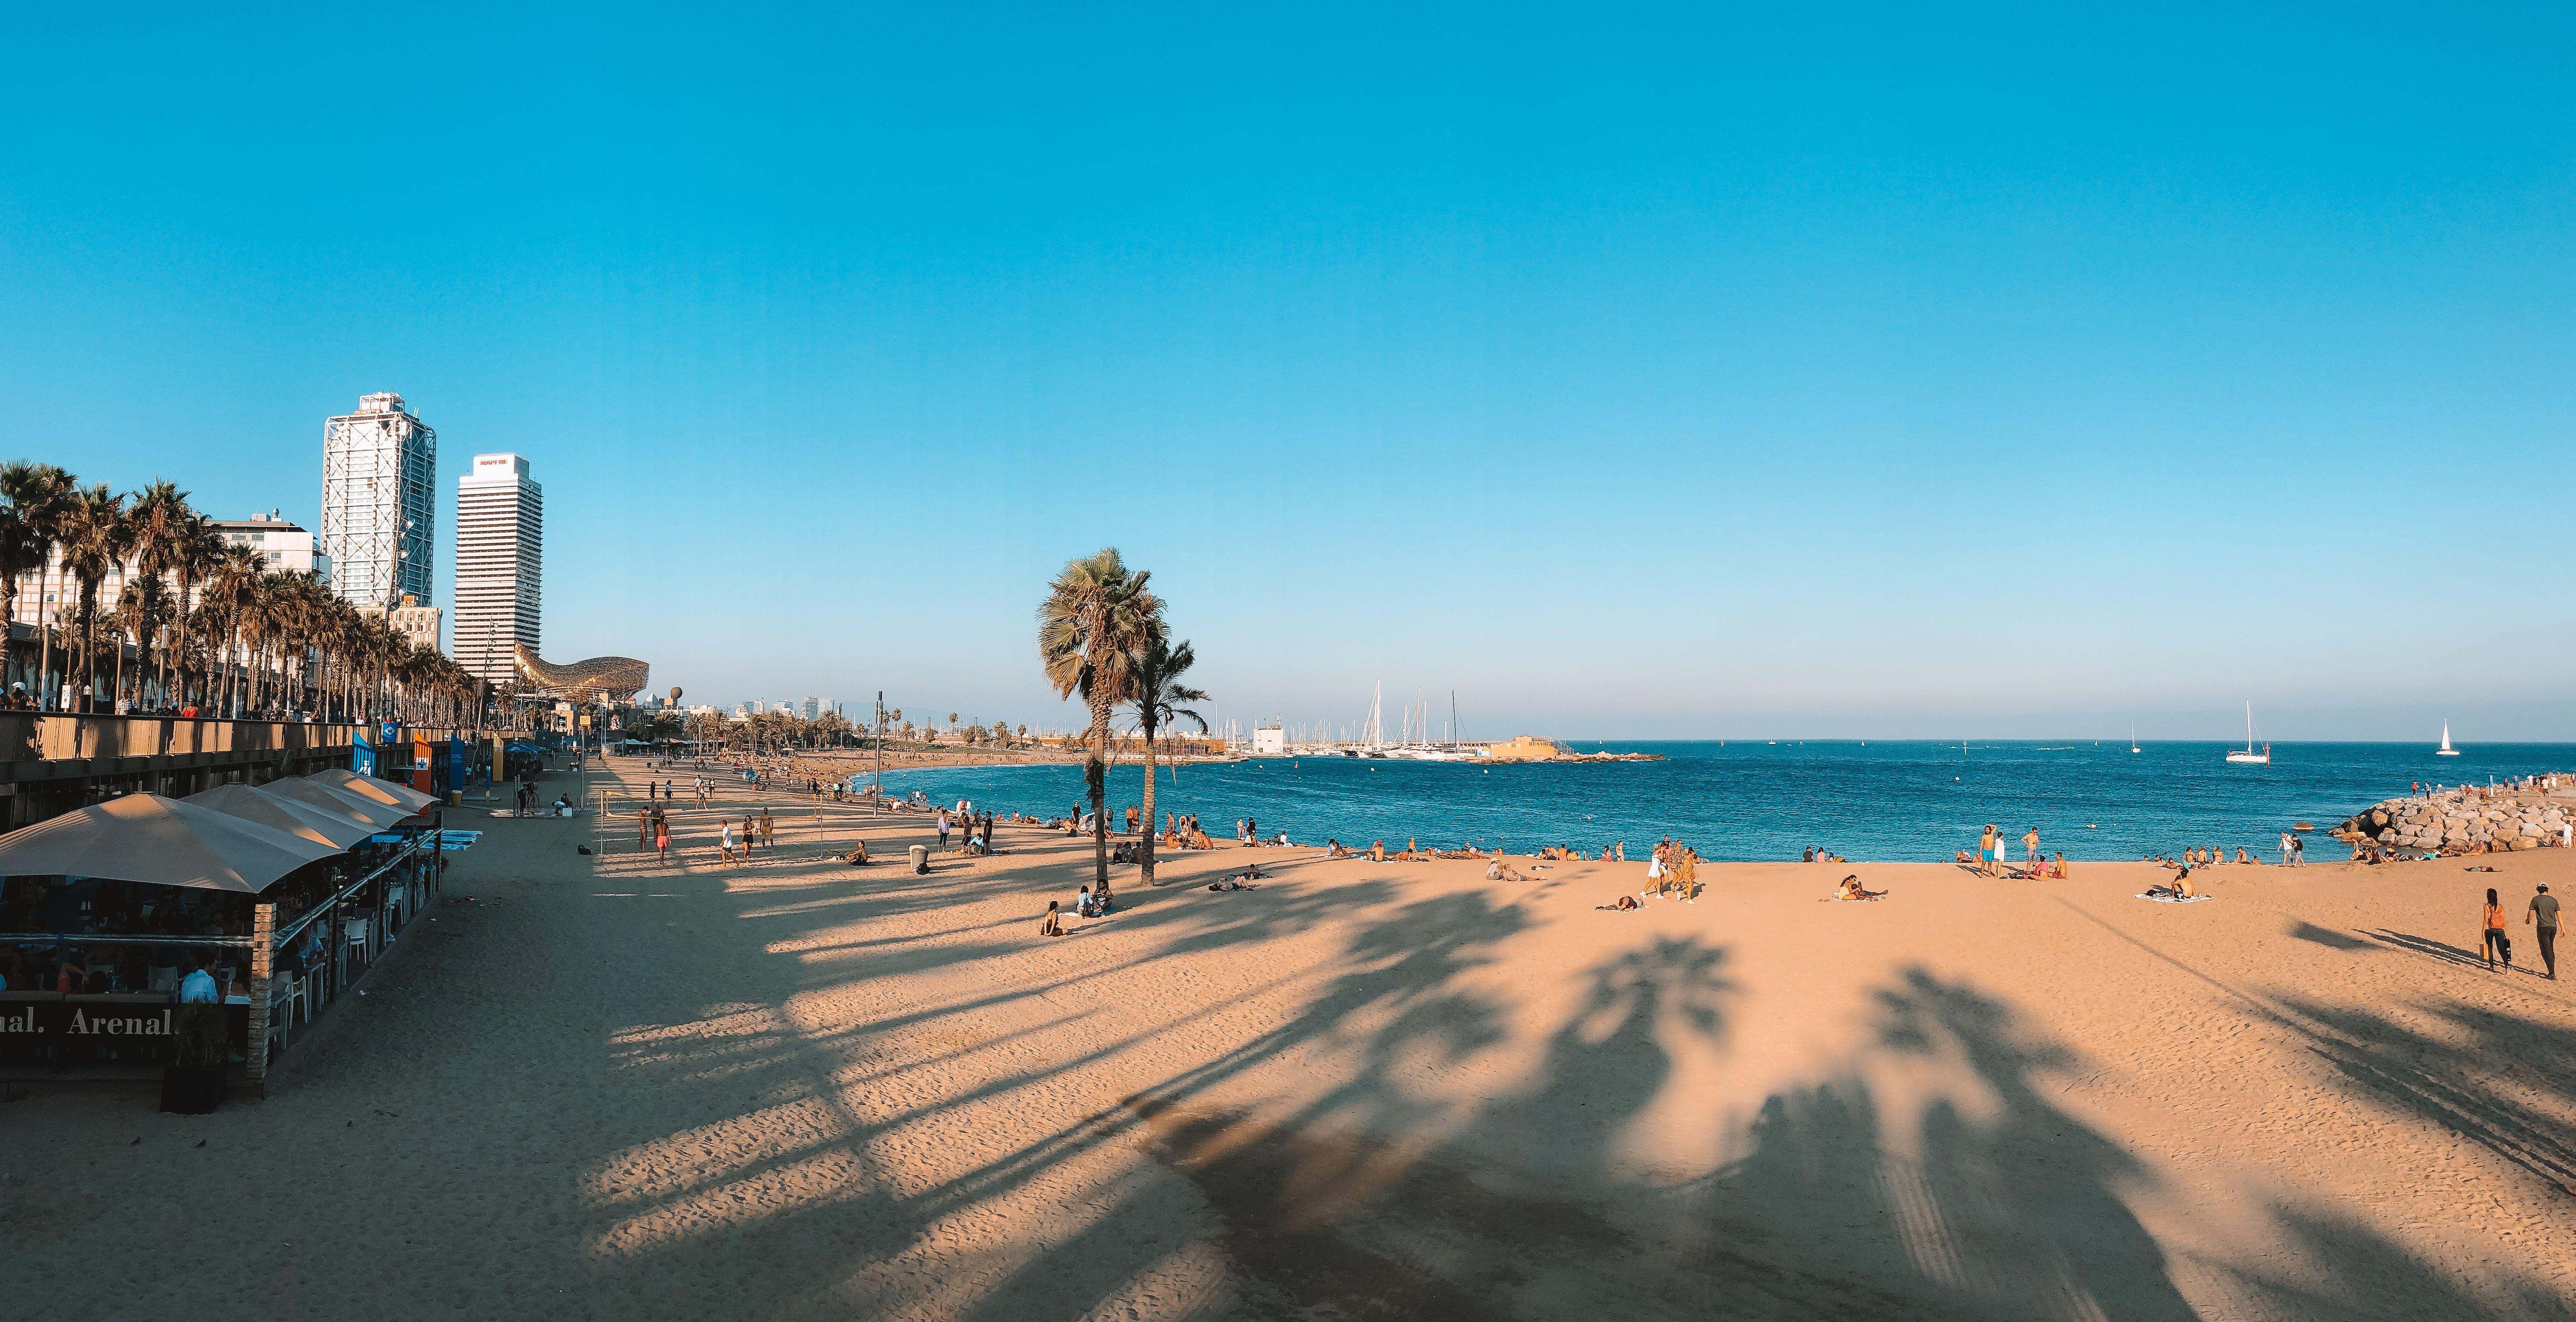 Barceloneta Beach at sunset